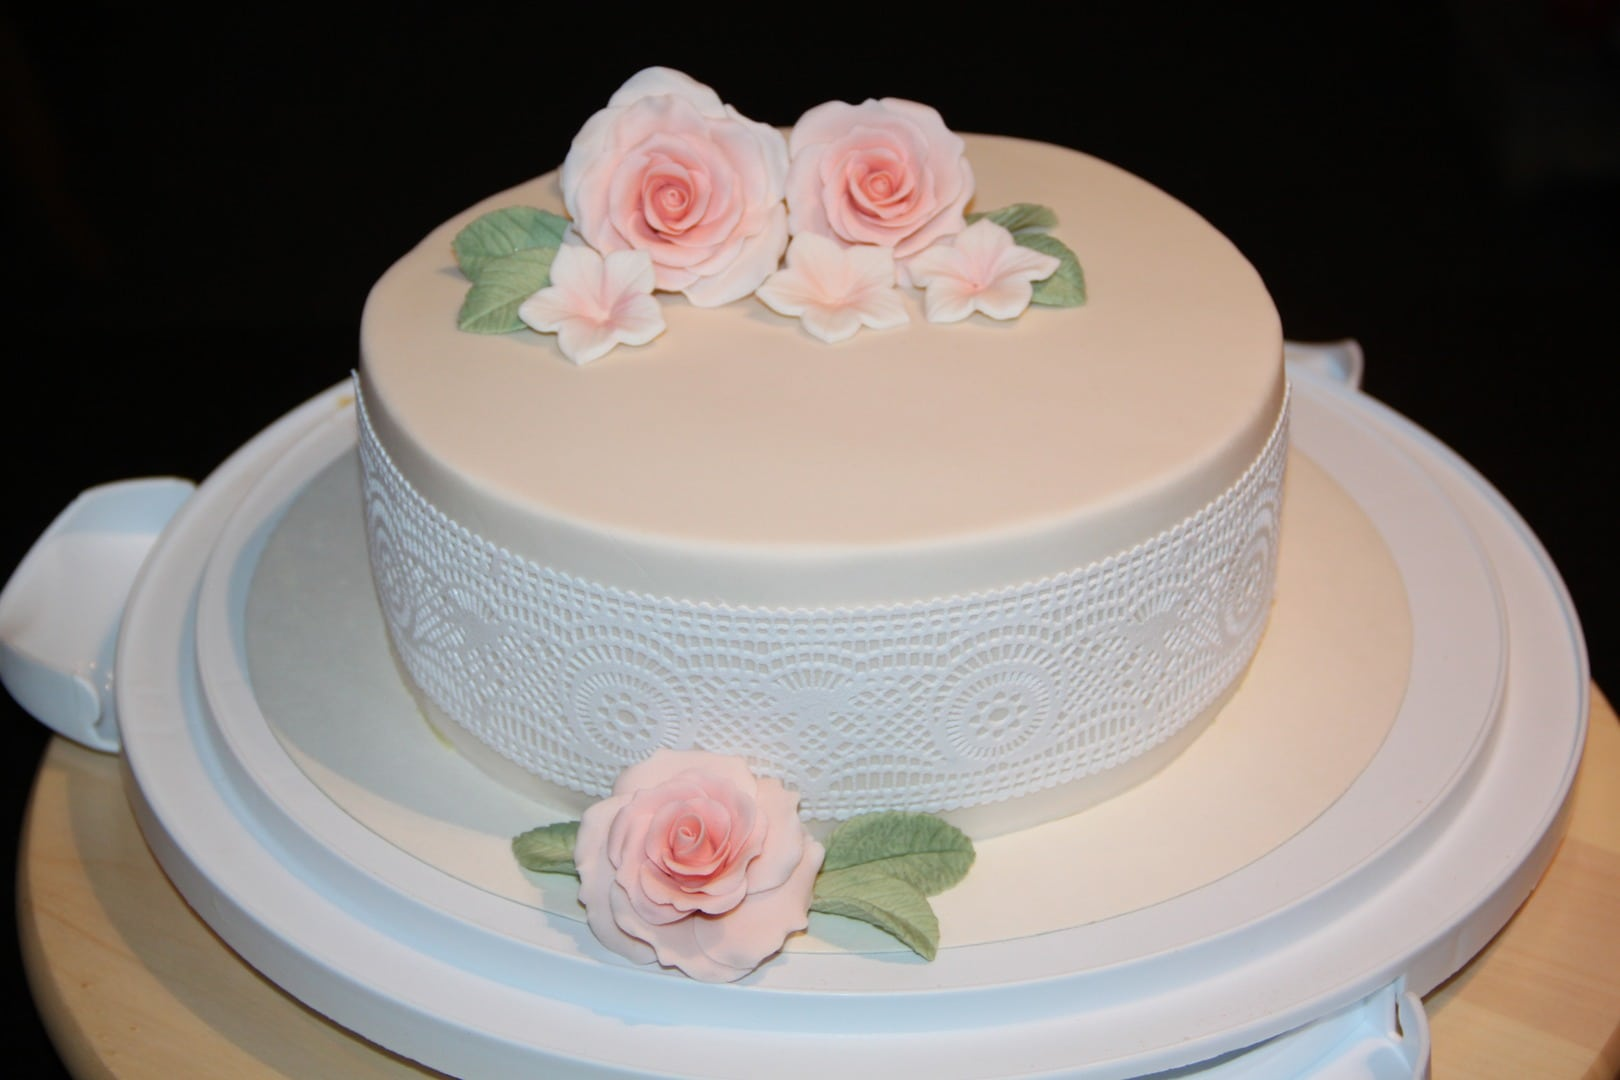 Decadent Drip Wedding Cakes - I DO YALL